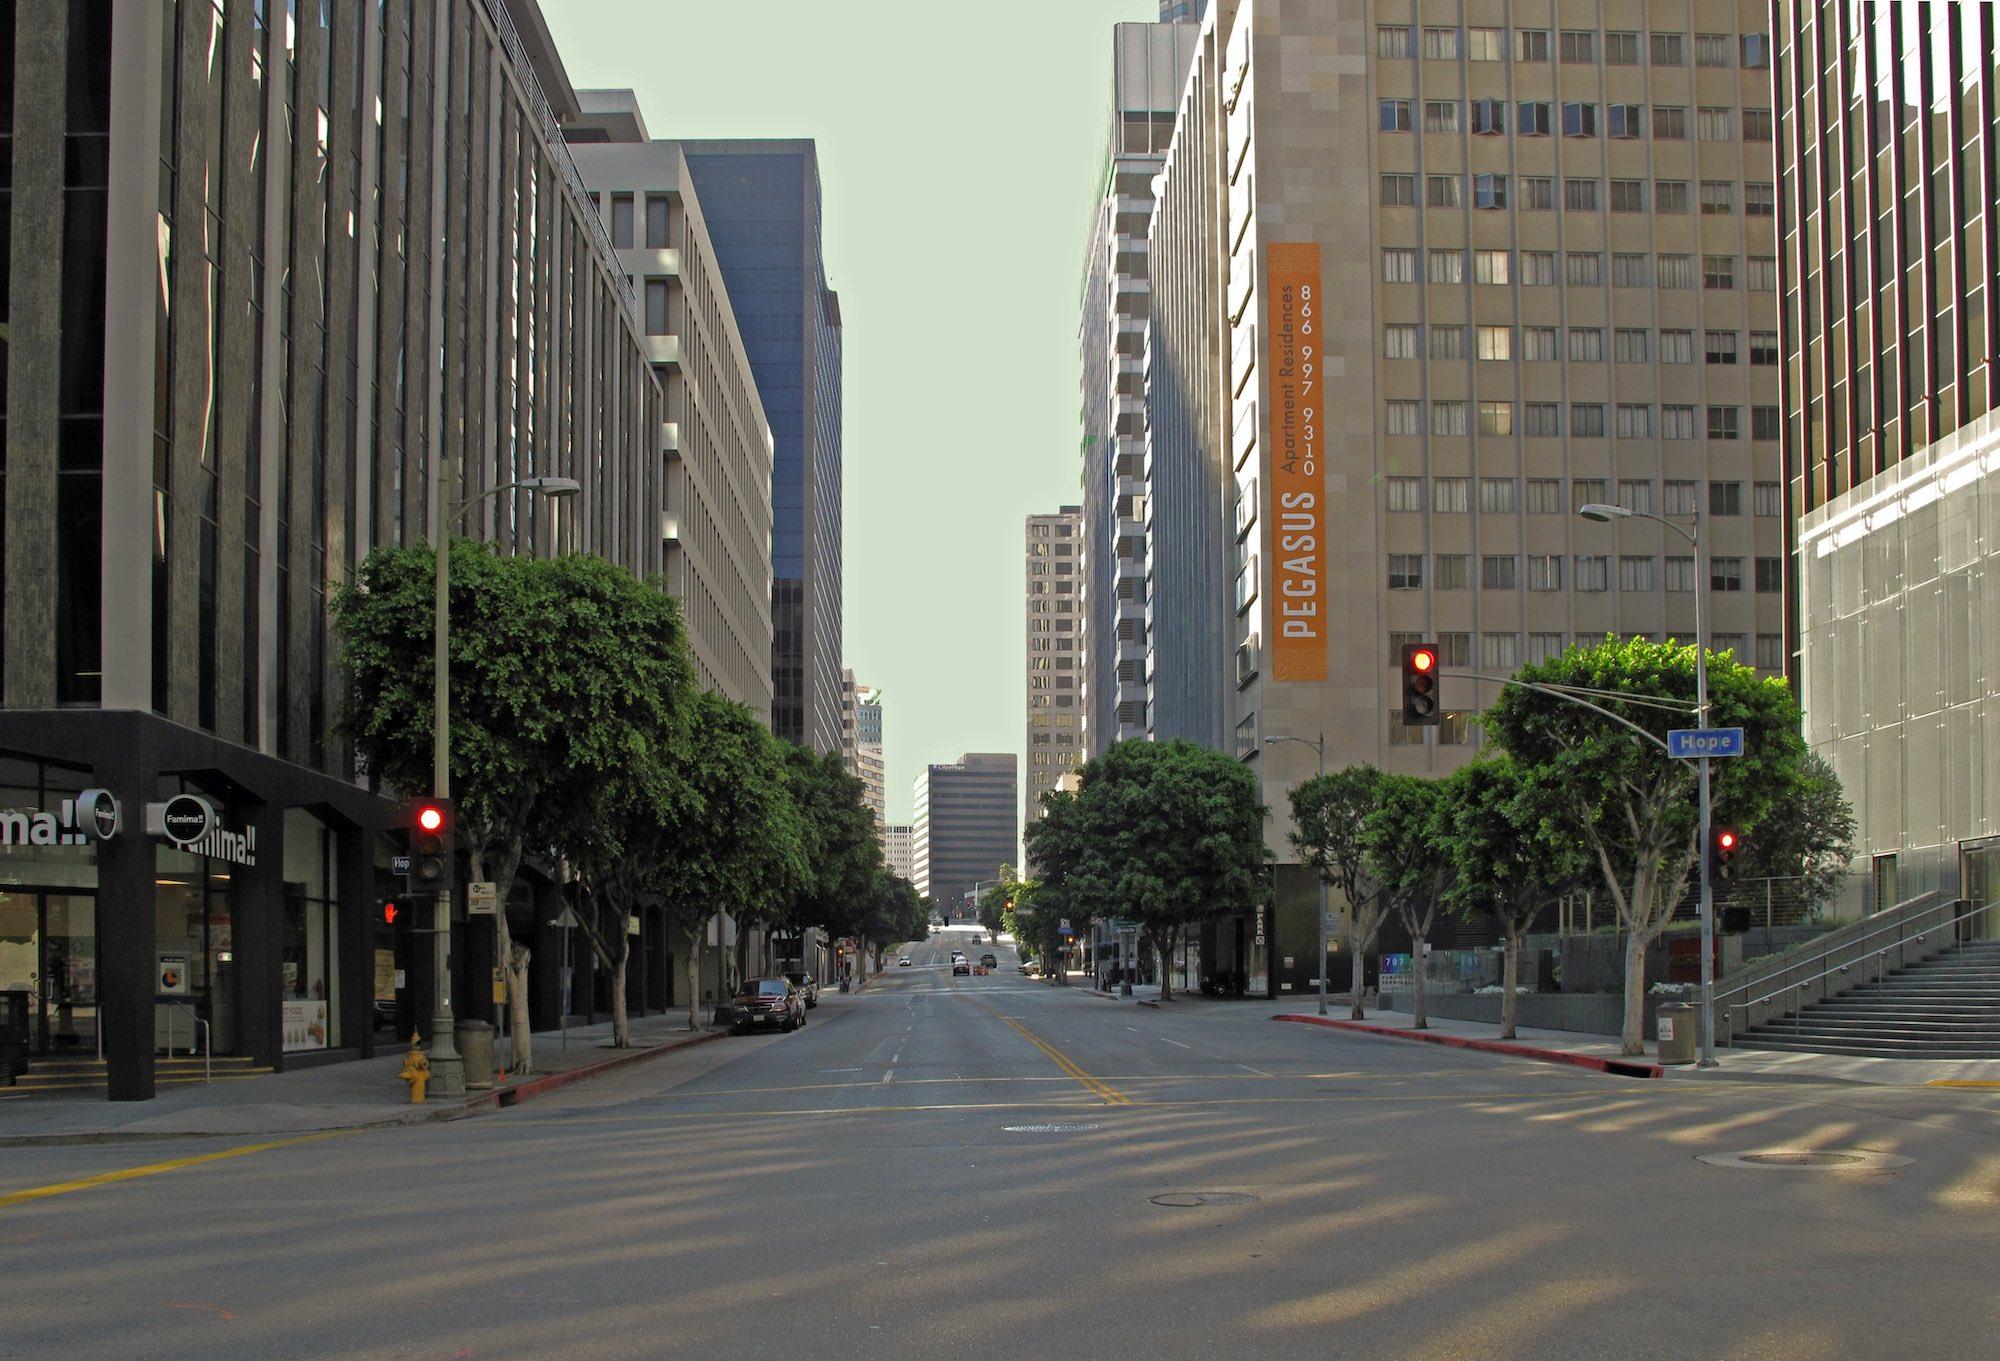 coronavirus lockdown empty streets